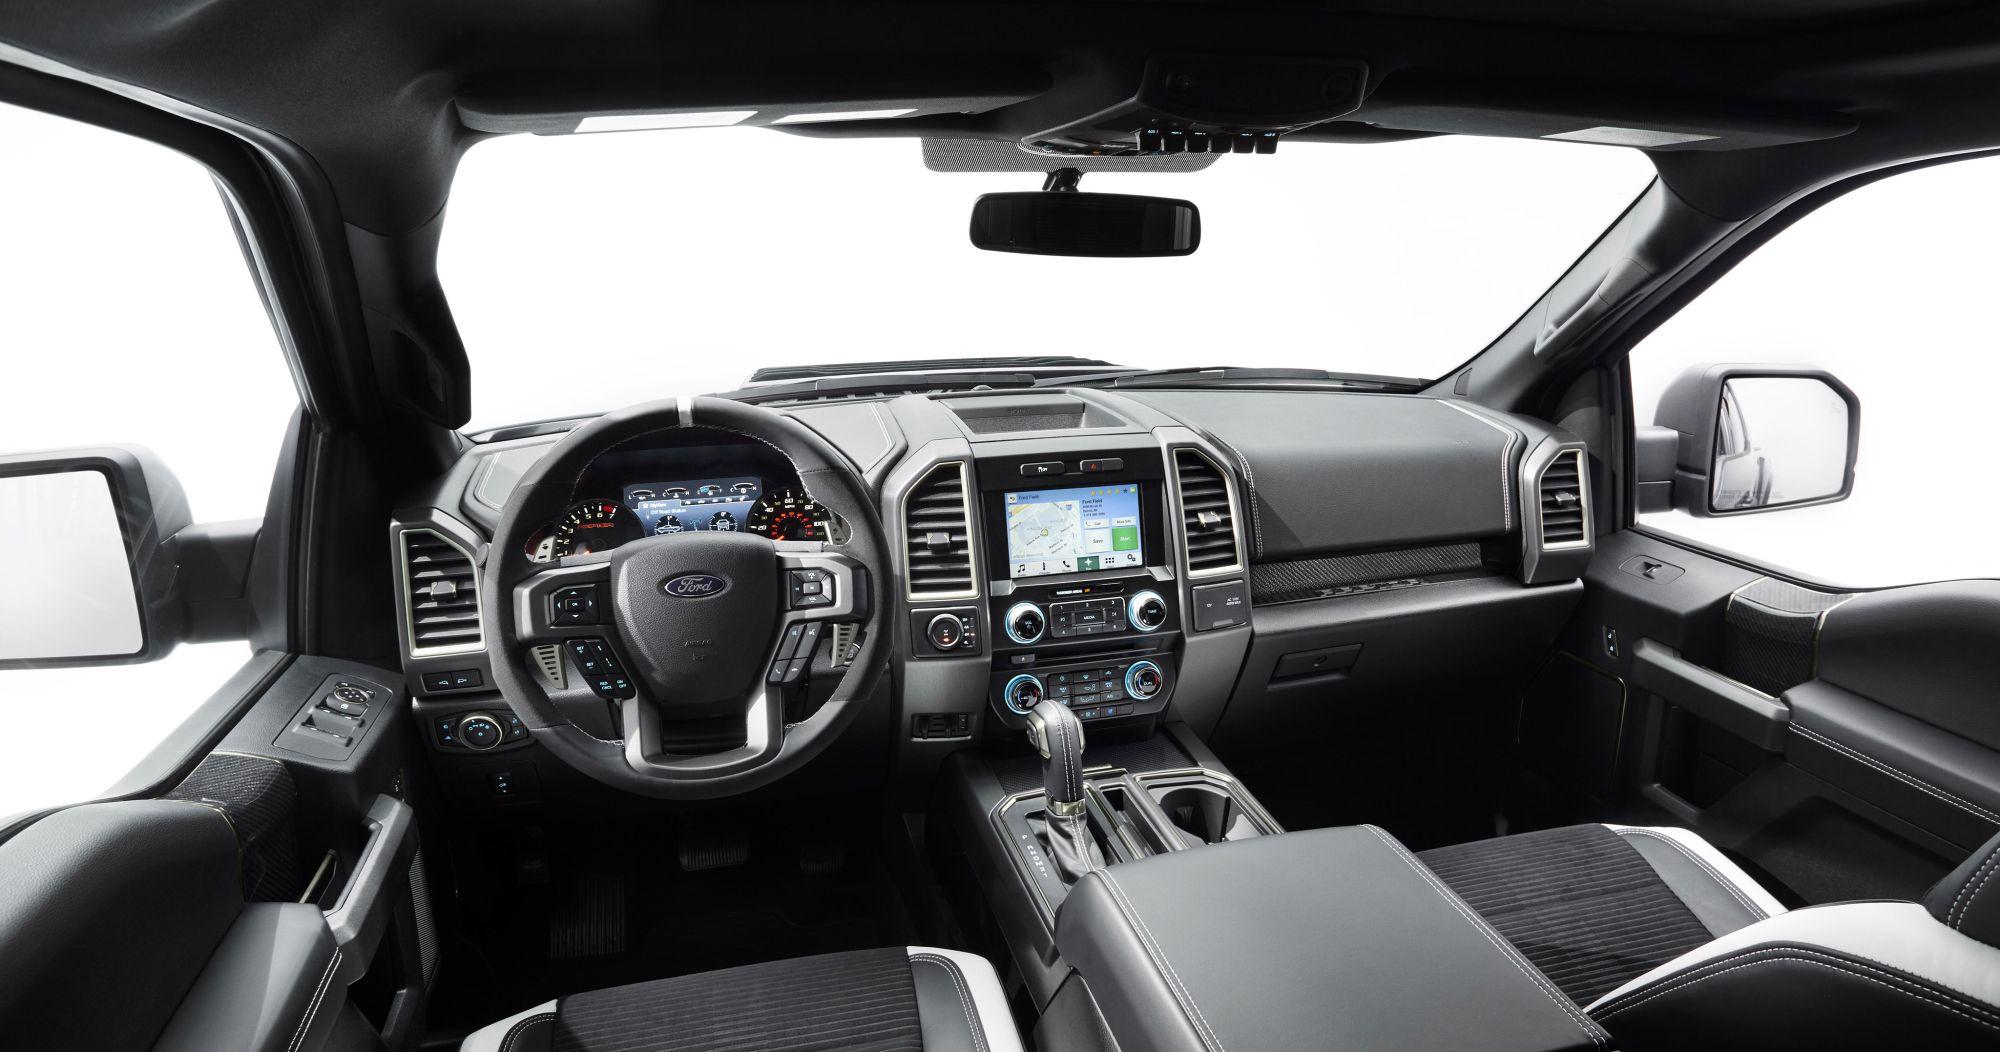 Ford F 150 Hp Ken V6 Raptor Pickup 4 Door 35 450 4x4 Automatic 2018 2019